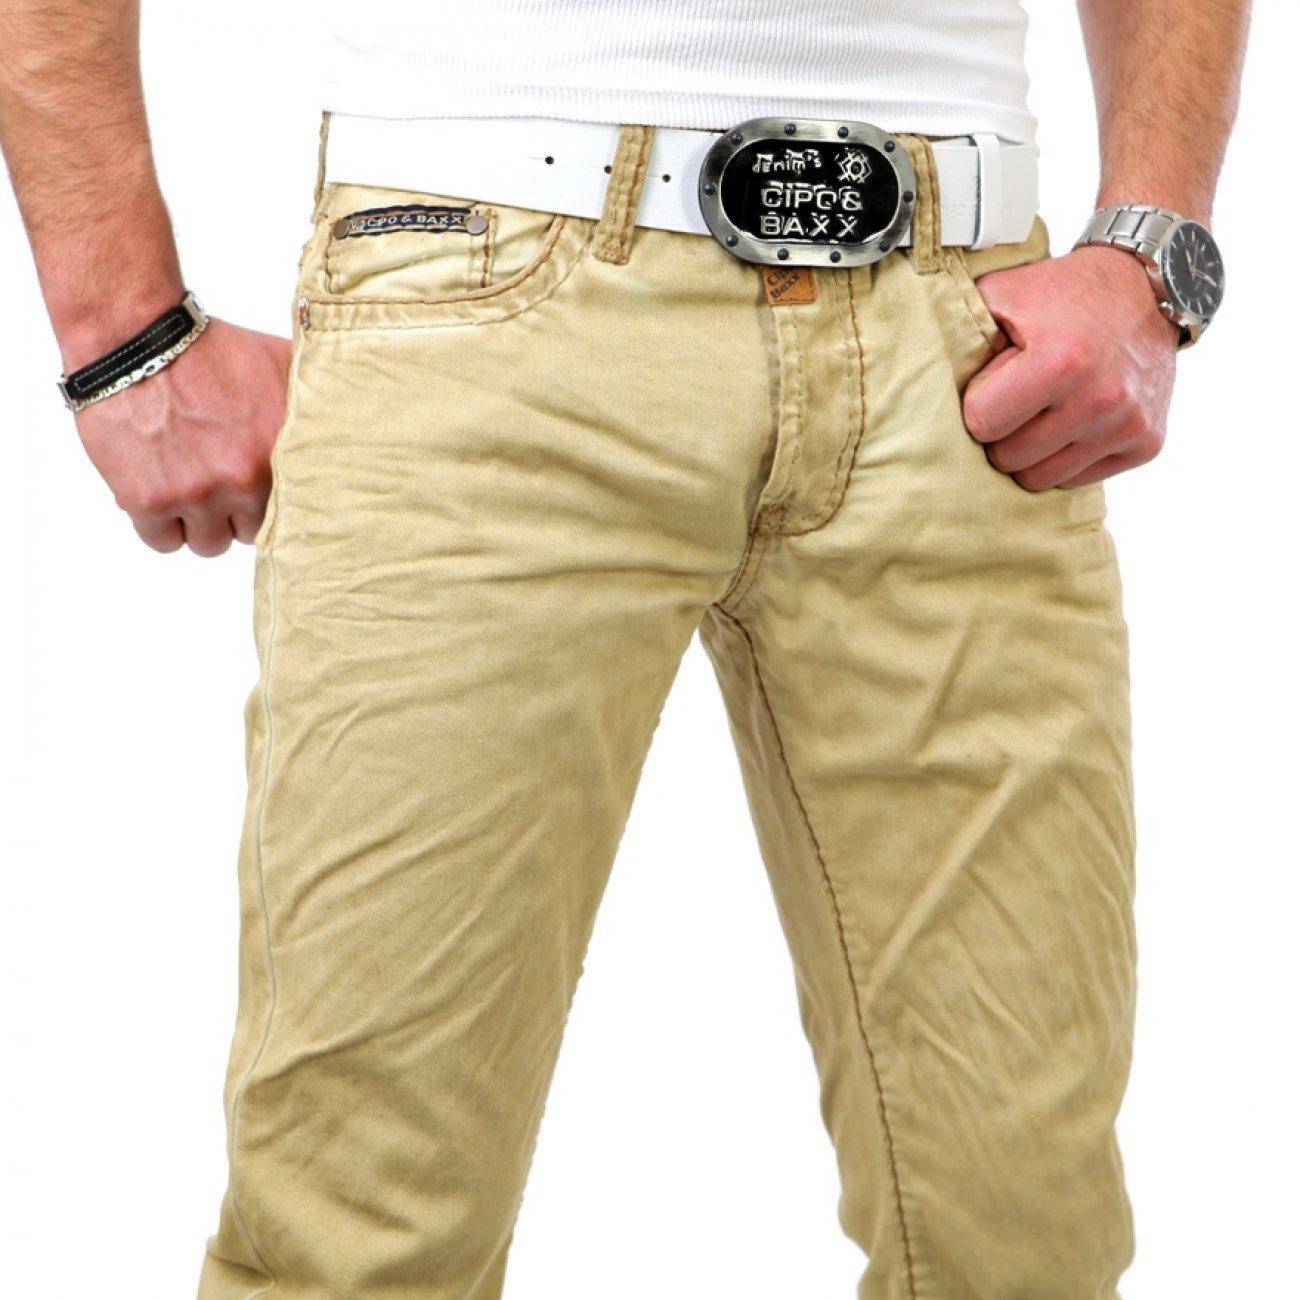 jeans herren mit dicken n hten camel cipo baxx g nstig. Black Bedroom Furniture Sets. Home Design Ideas